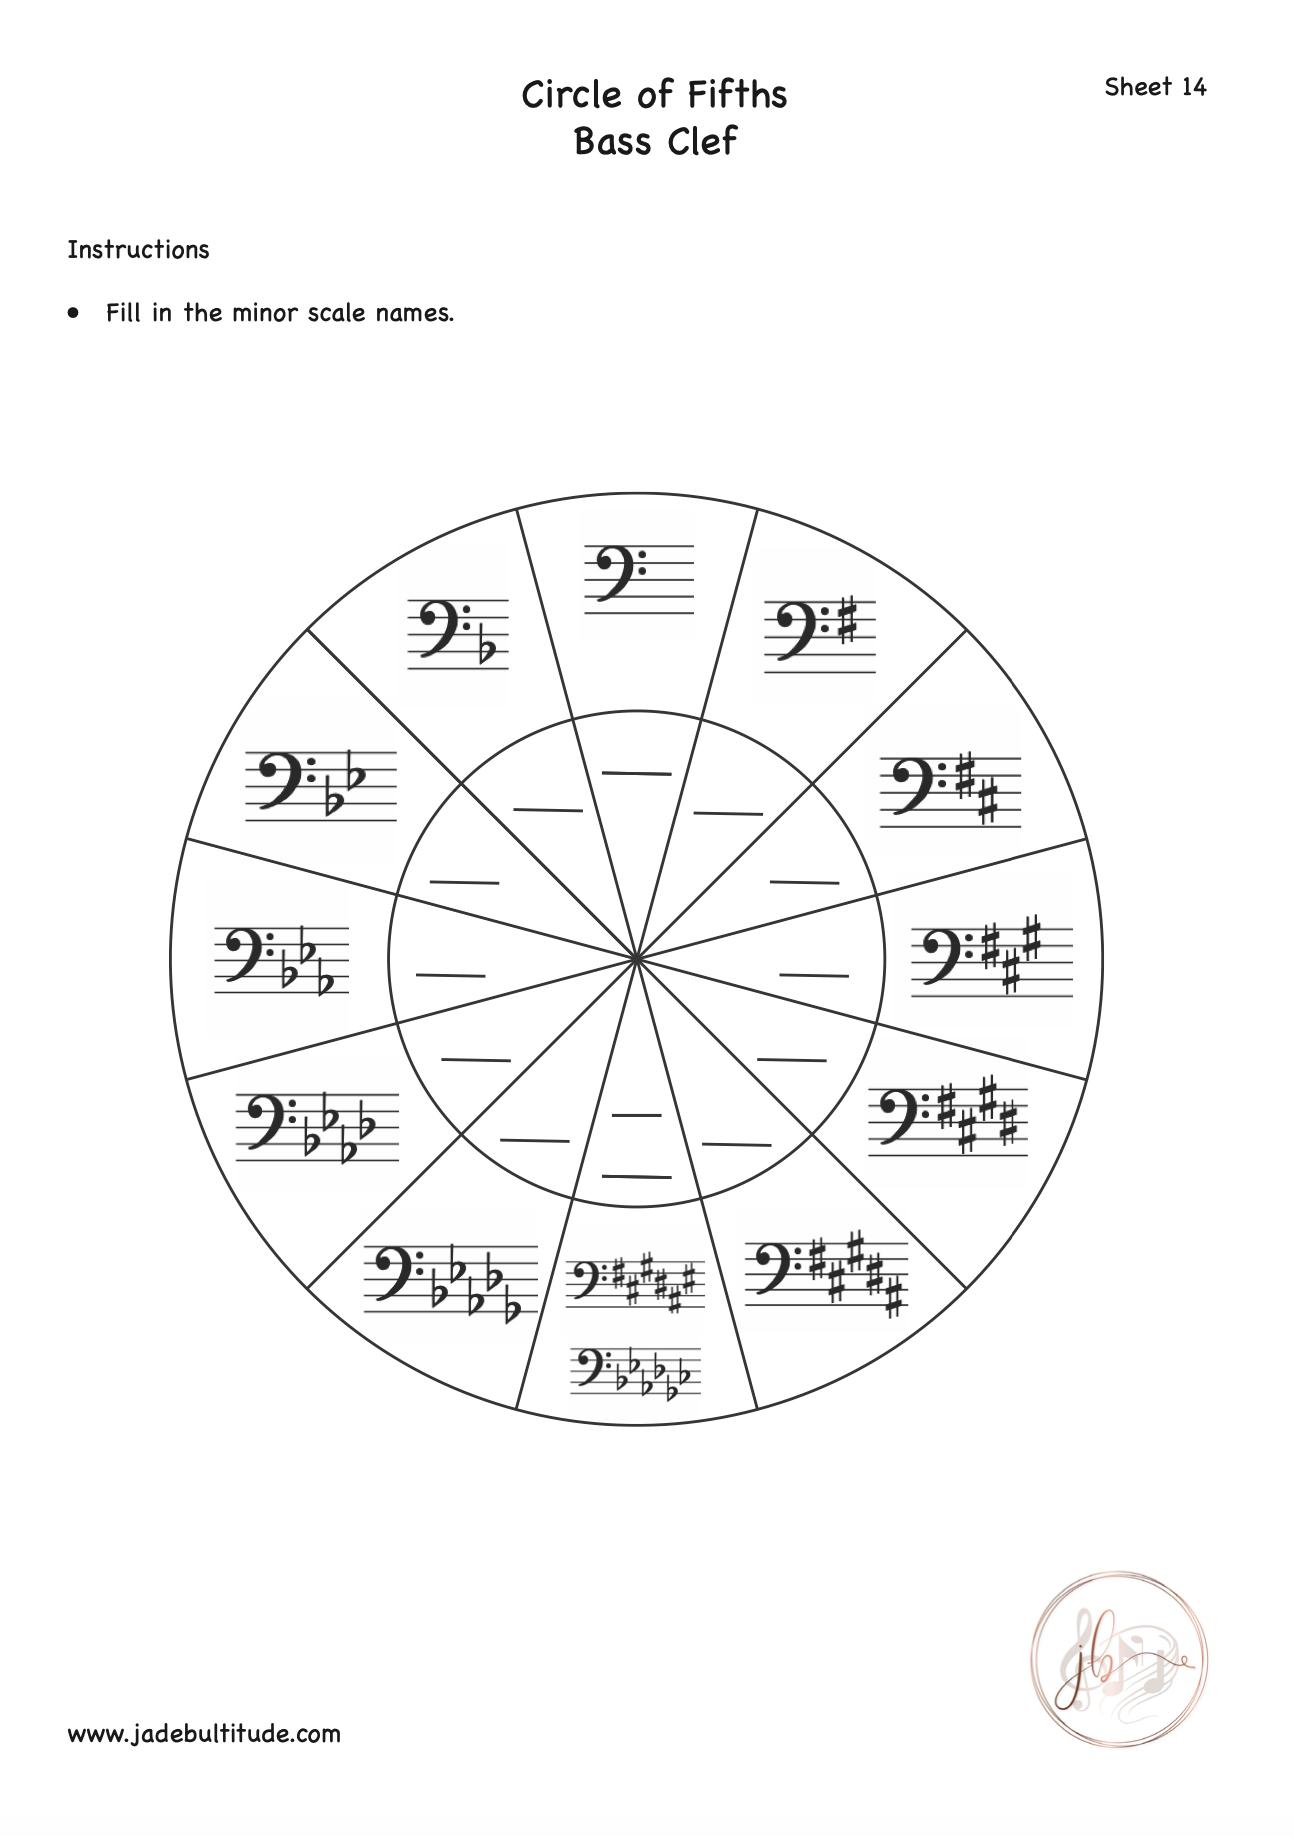 Circle Of Fifths Worksheet Bass Clef Minor Key Signature